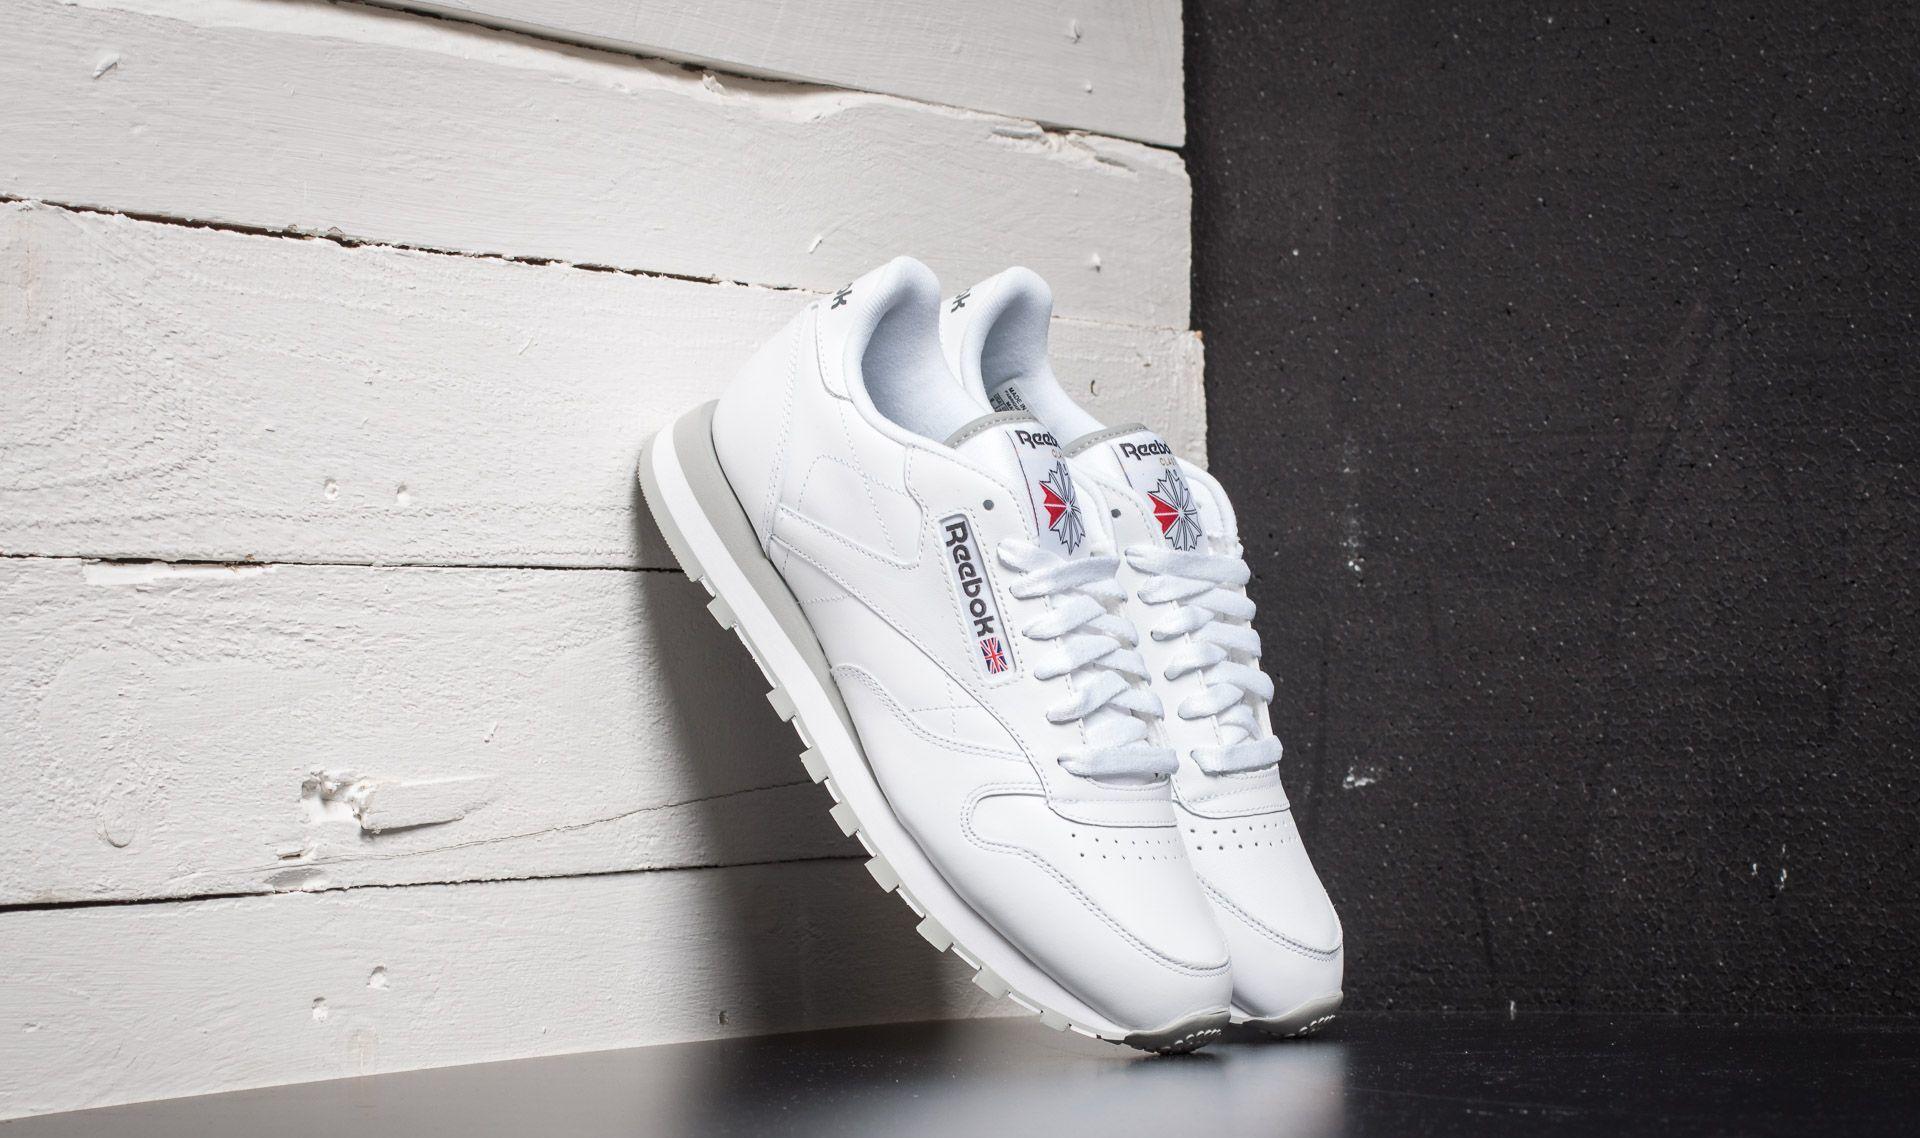 Reebok Classic Leather White/Light Grey 2214